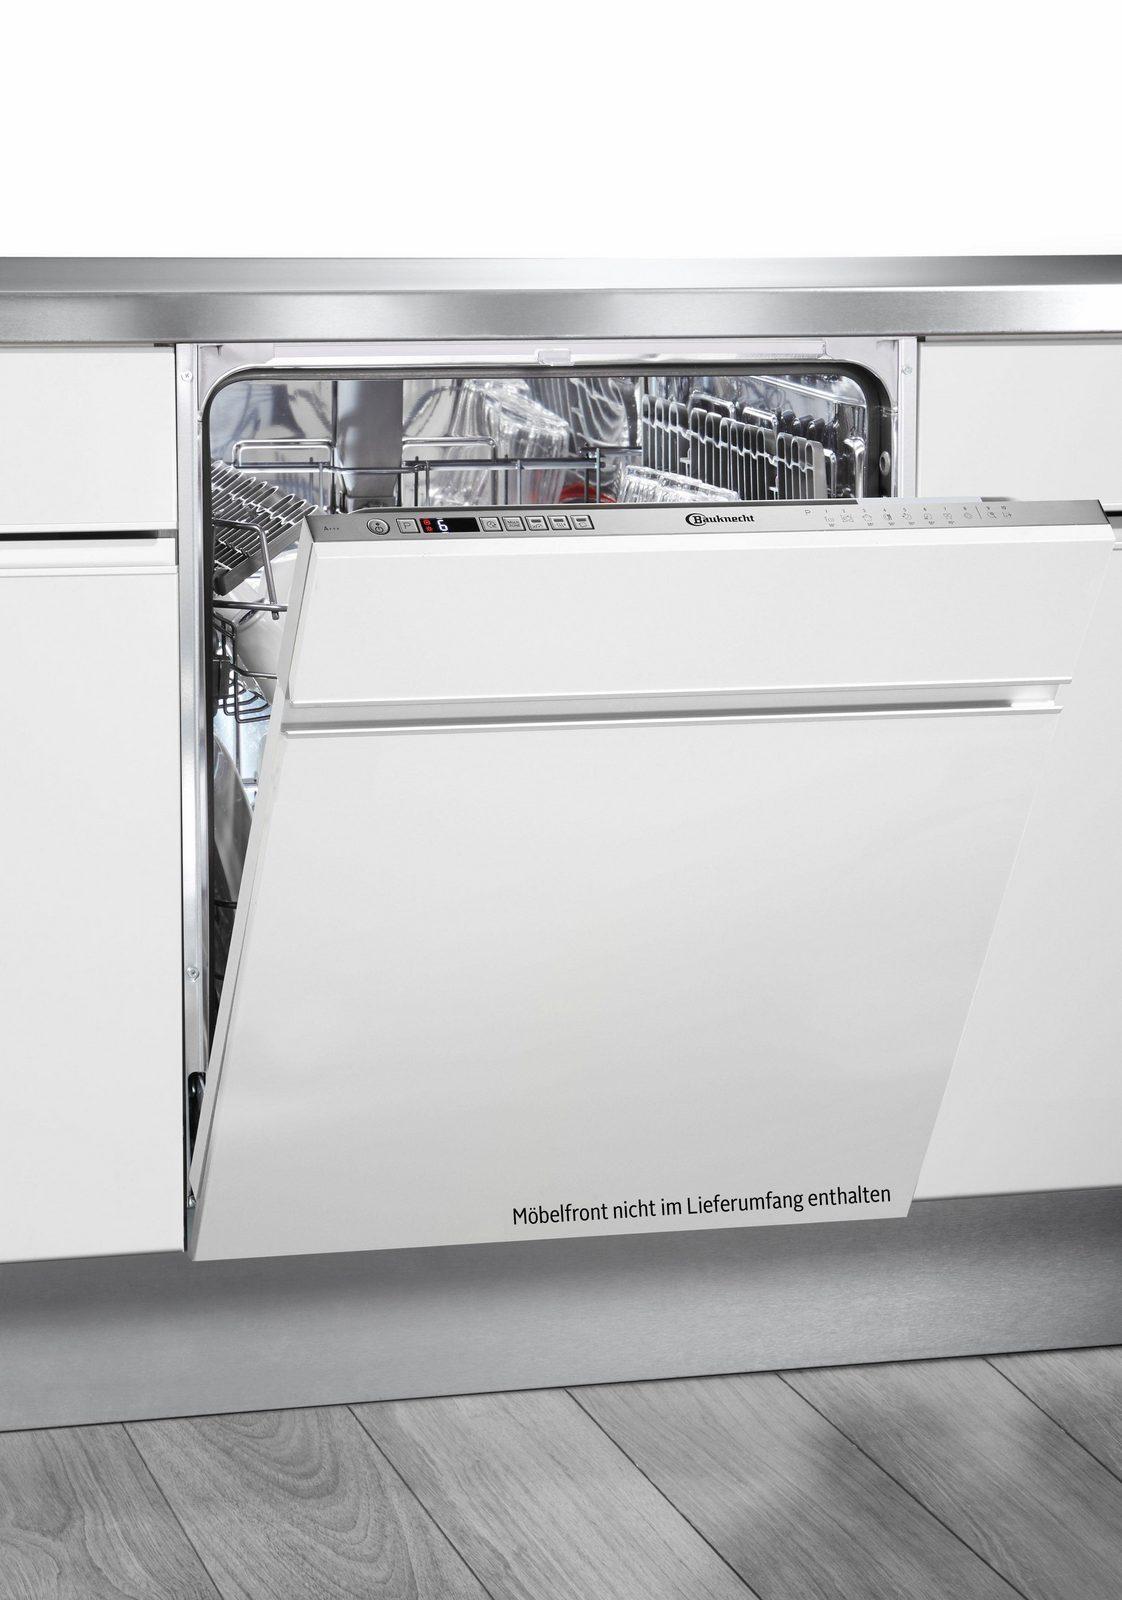 BAUKNECHT Vollintegrierbarer Einbaugeschirrspüler OBIO Super Eco, A+++, 9 Liter, 14 Maßgedecke